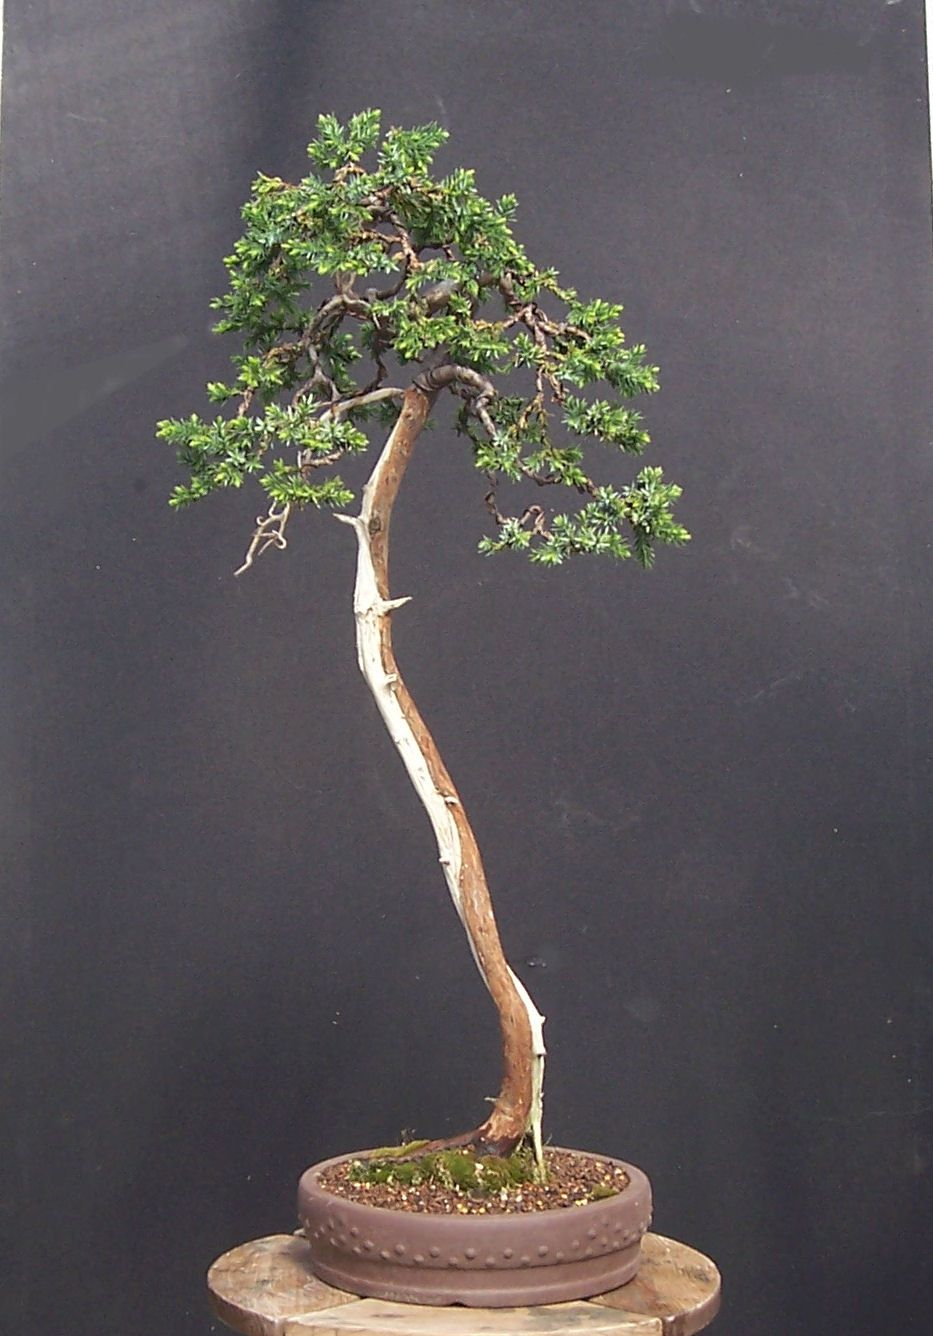 Miko bonsai gallery of my bonsai for Literati bonsai gallery